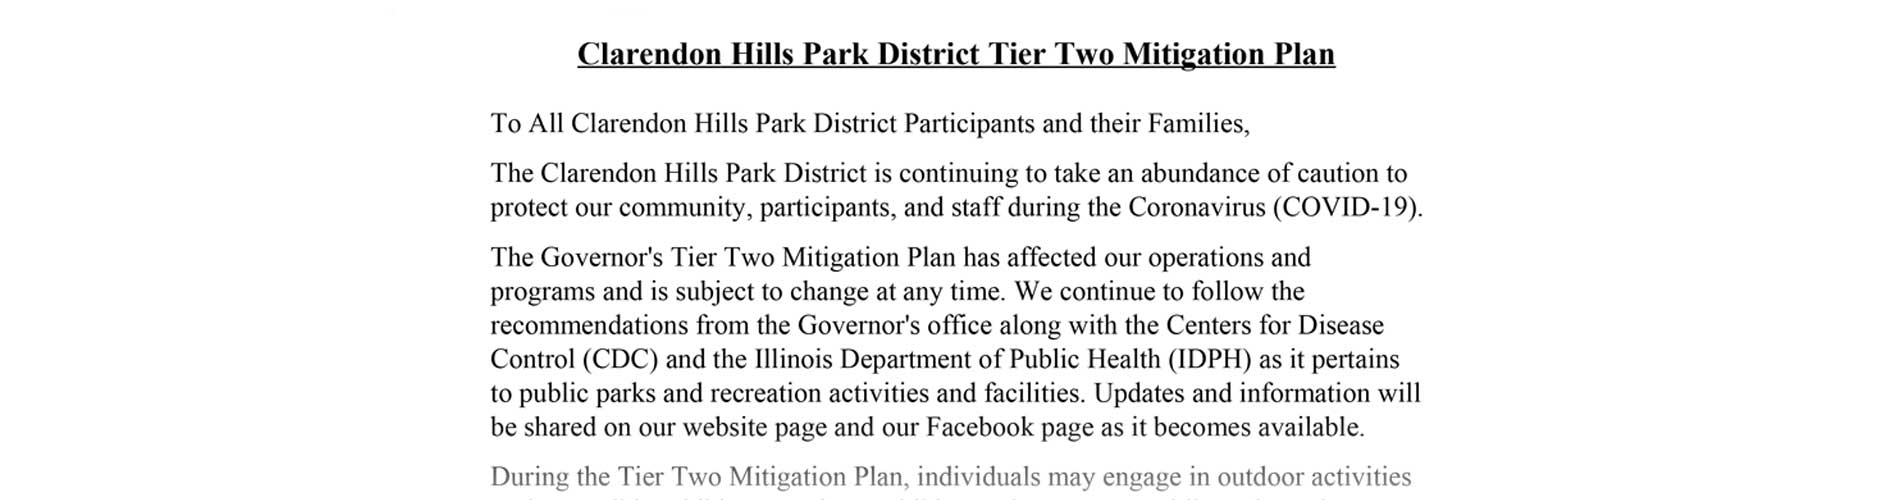 Covid 19 Tier Two Mitigation Plan